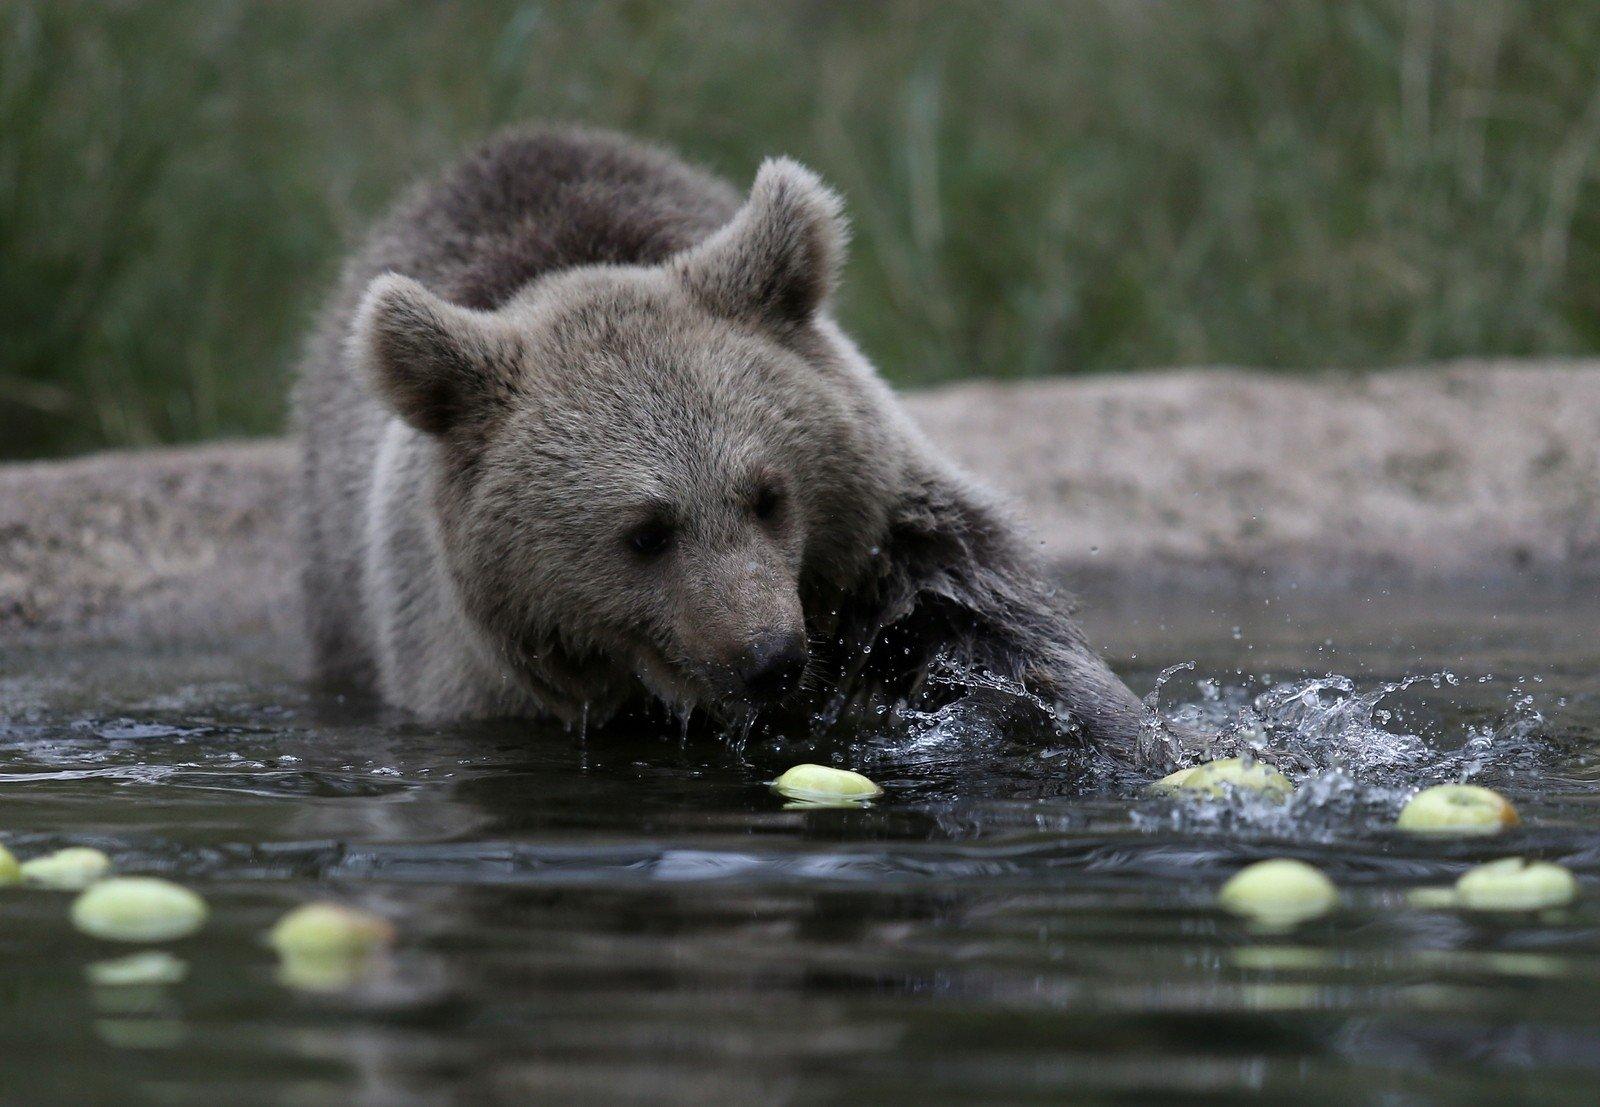 A cub tries to grab an apple fell into a pond at the shelter, in Bursa, northwestern Turkey, Nov. 12, 2020. (İHA Photo)